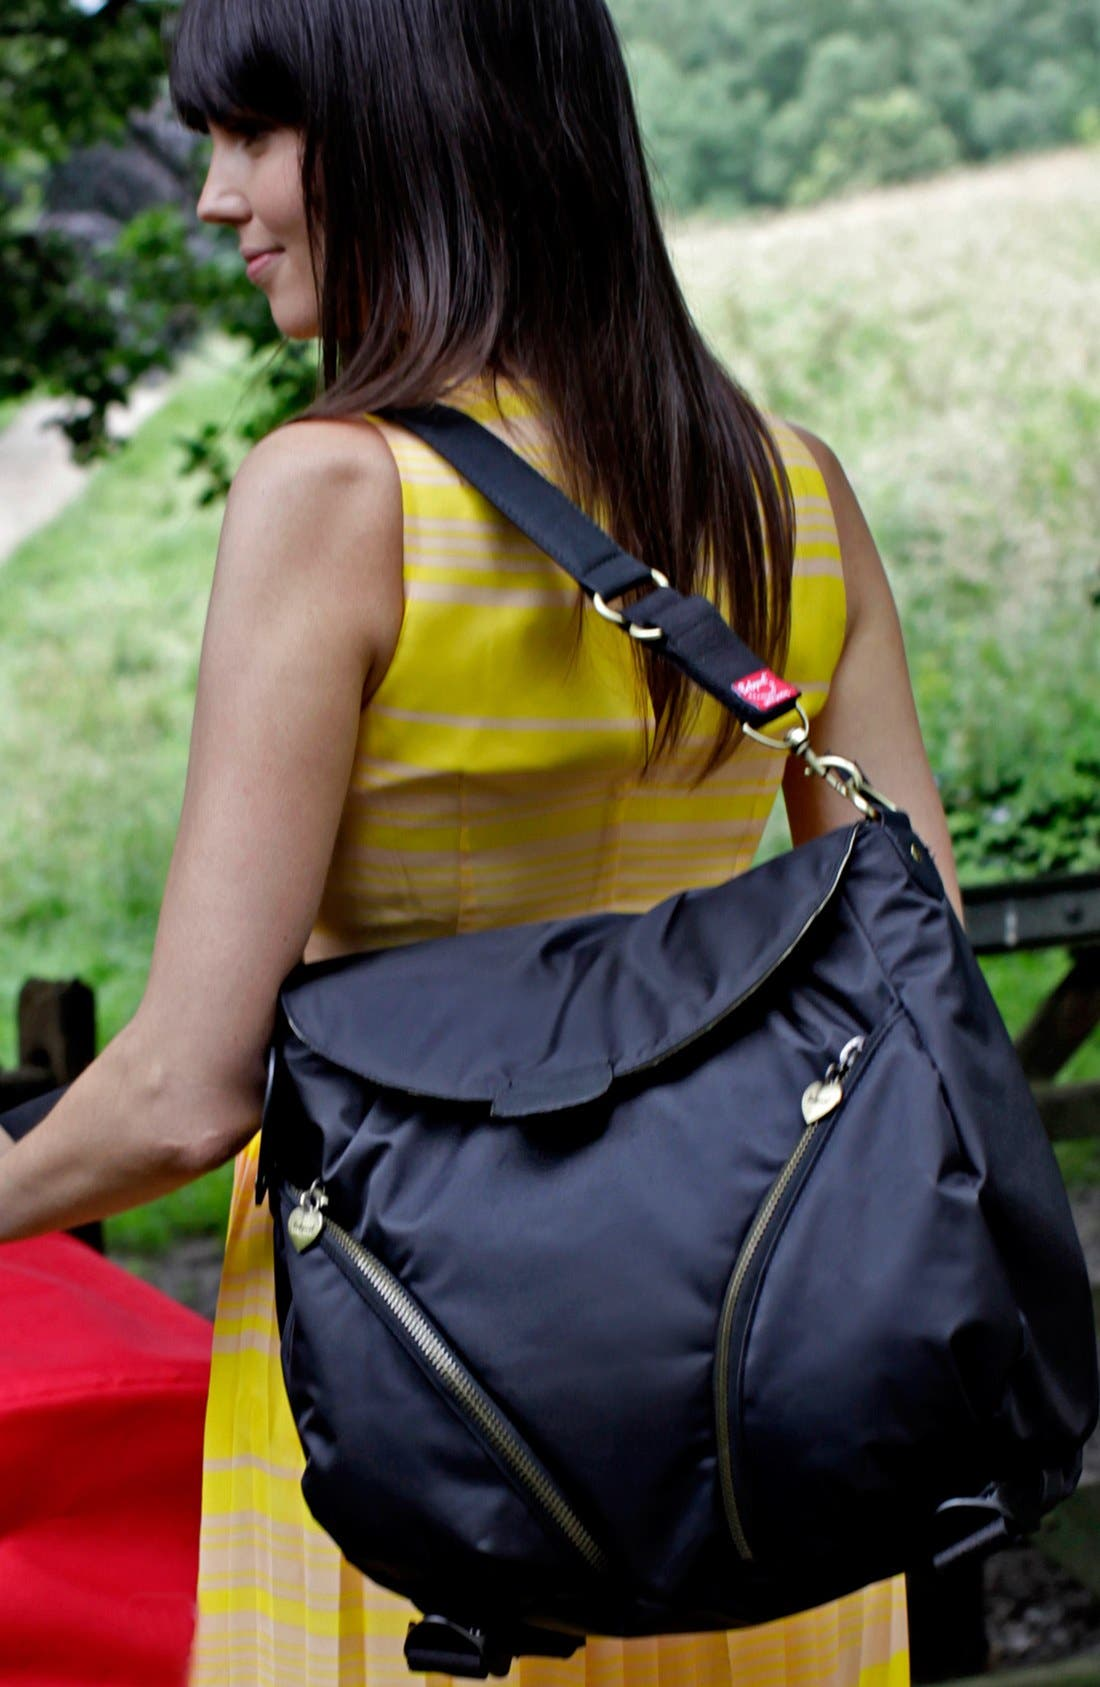 Alternate Image 3  - Babymel 'Ruby' Convertible Backpack Diaper Bag